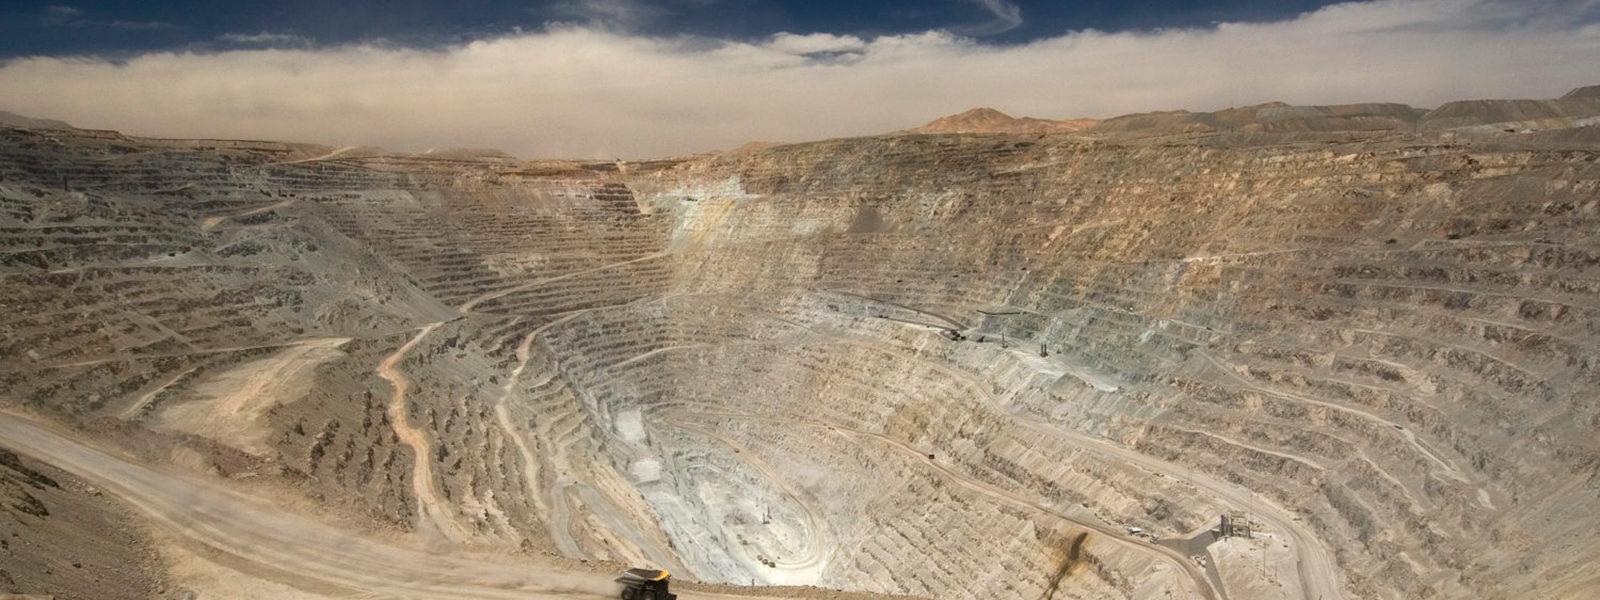 Chuquicamata Mine, a previous Kennecott holding in Chile